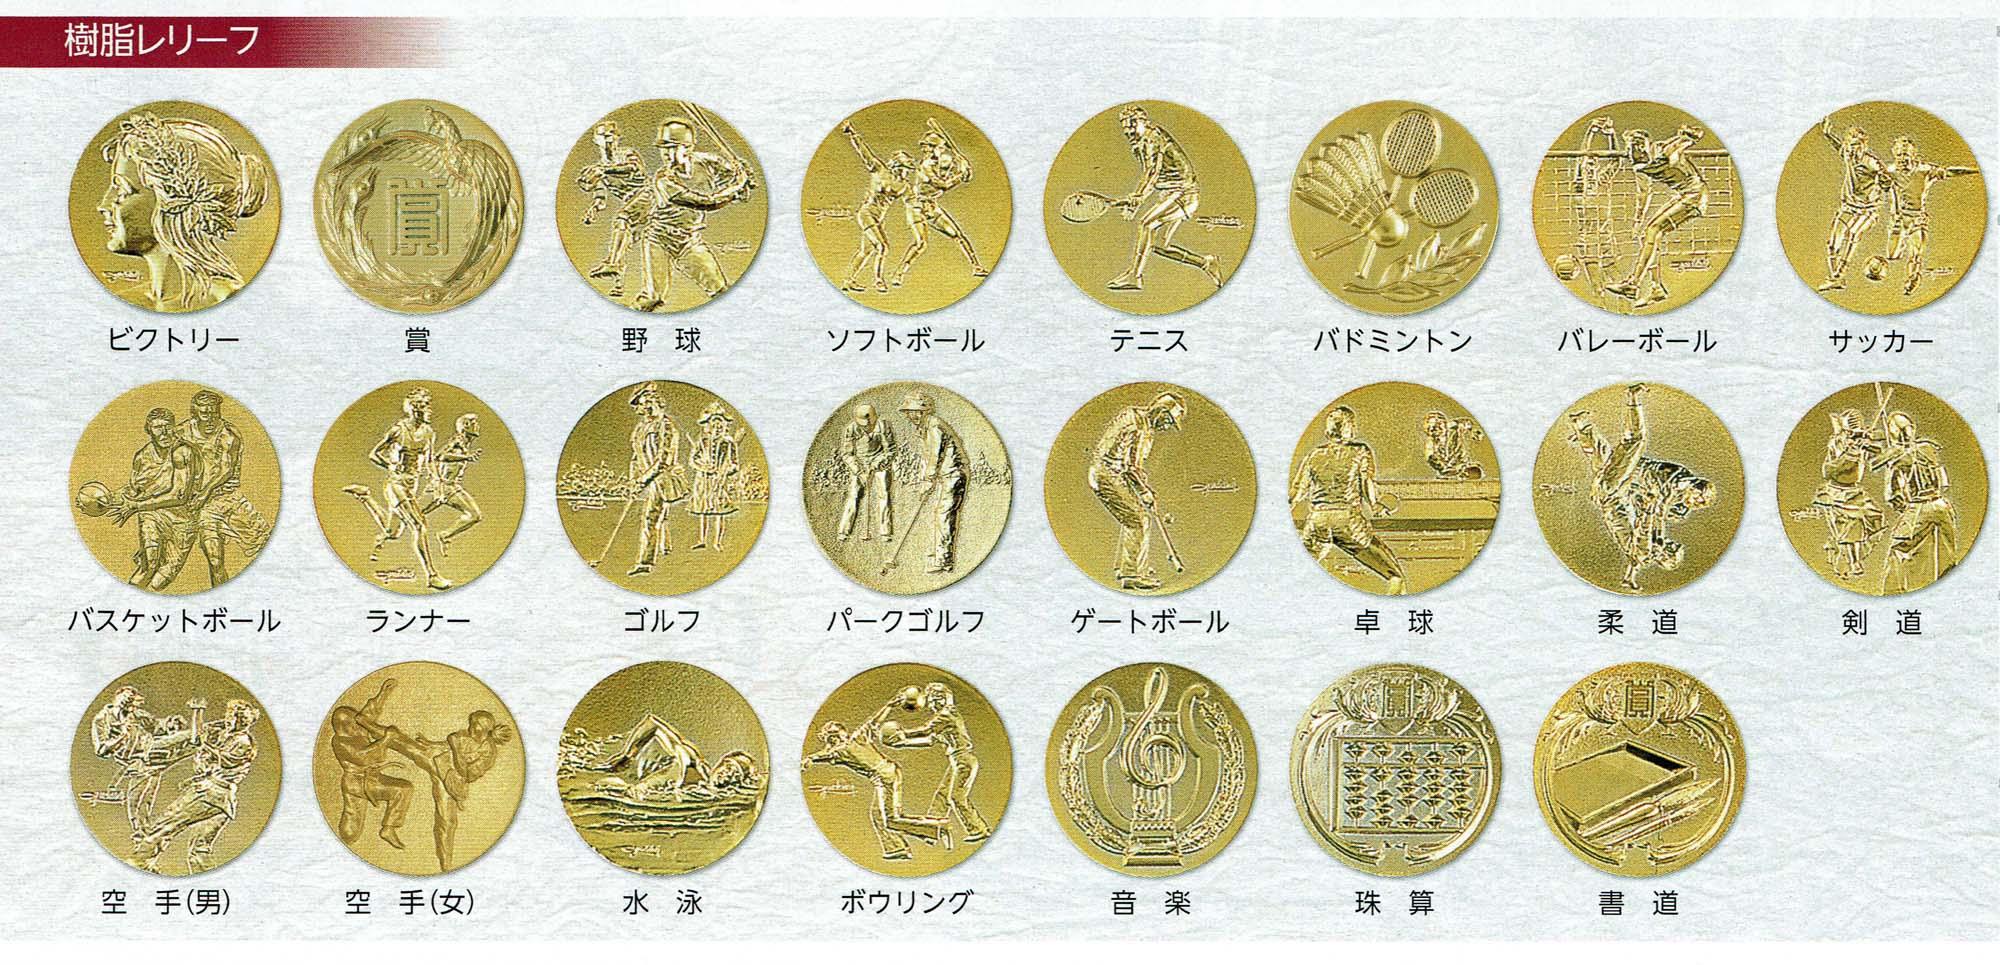 MFメダル専用 樹脂レリーフ一覧